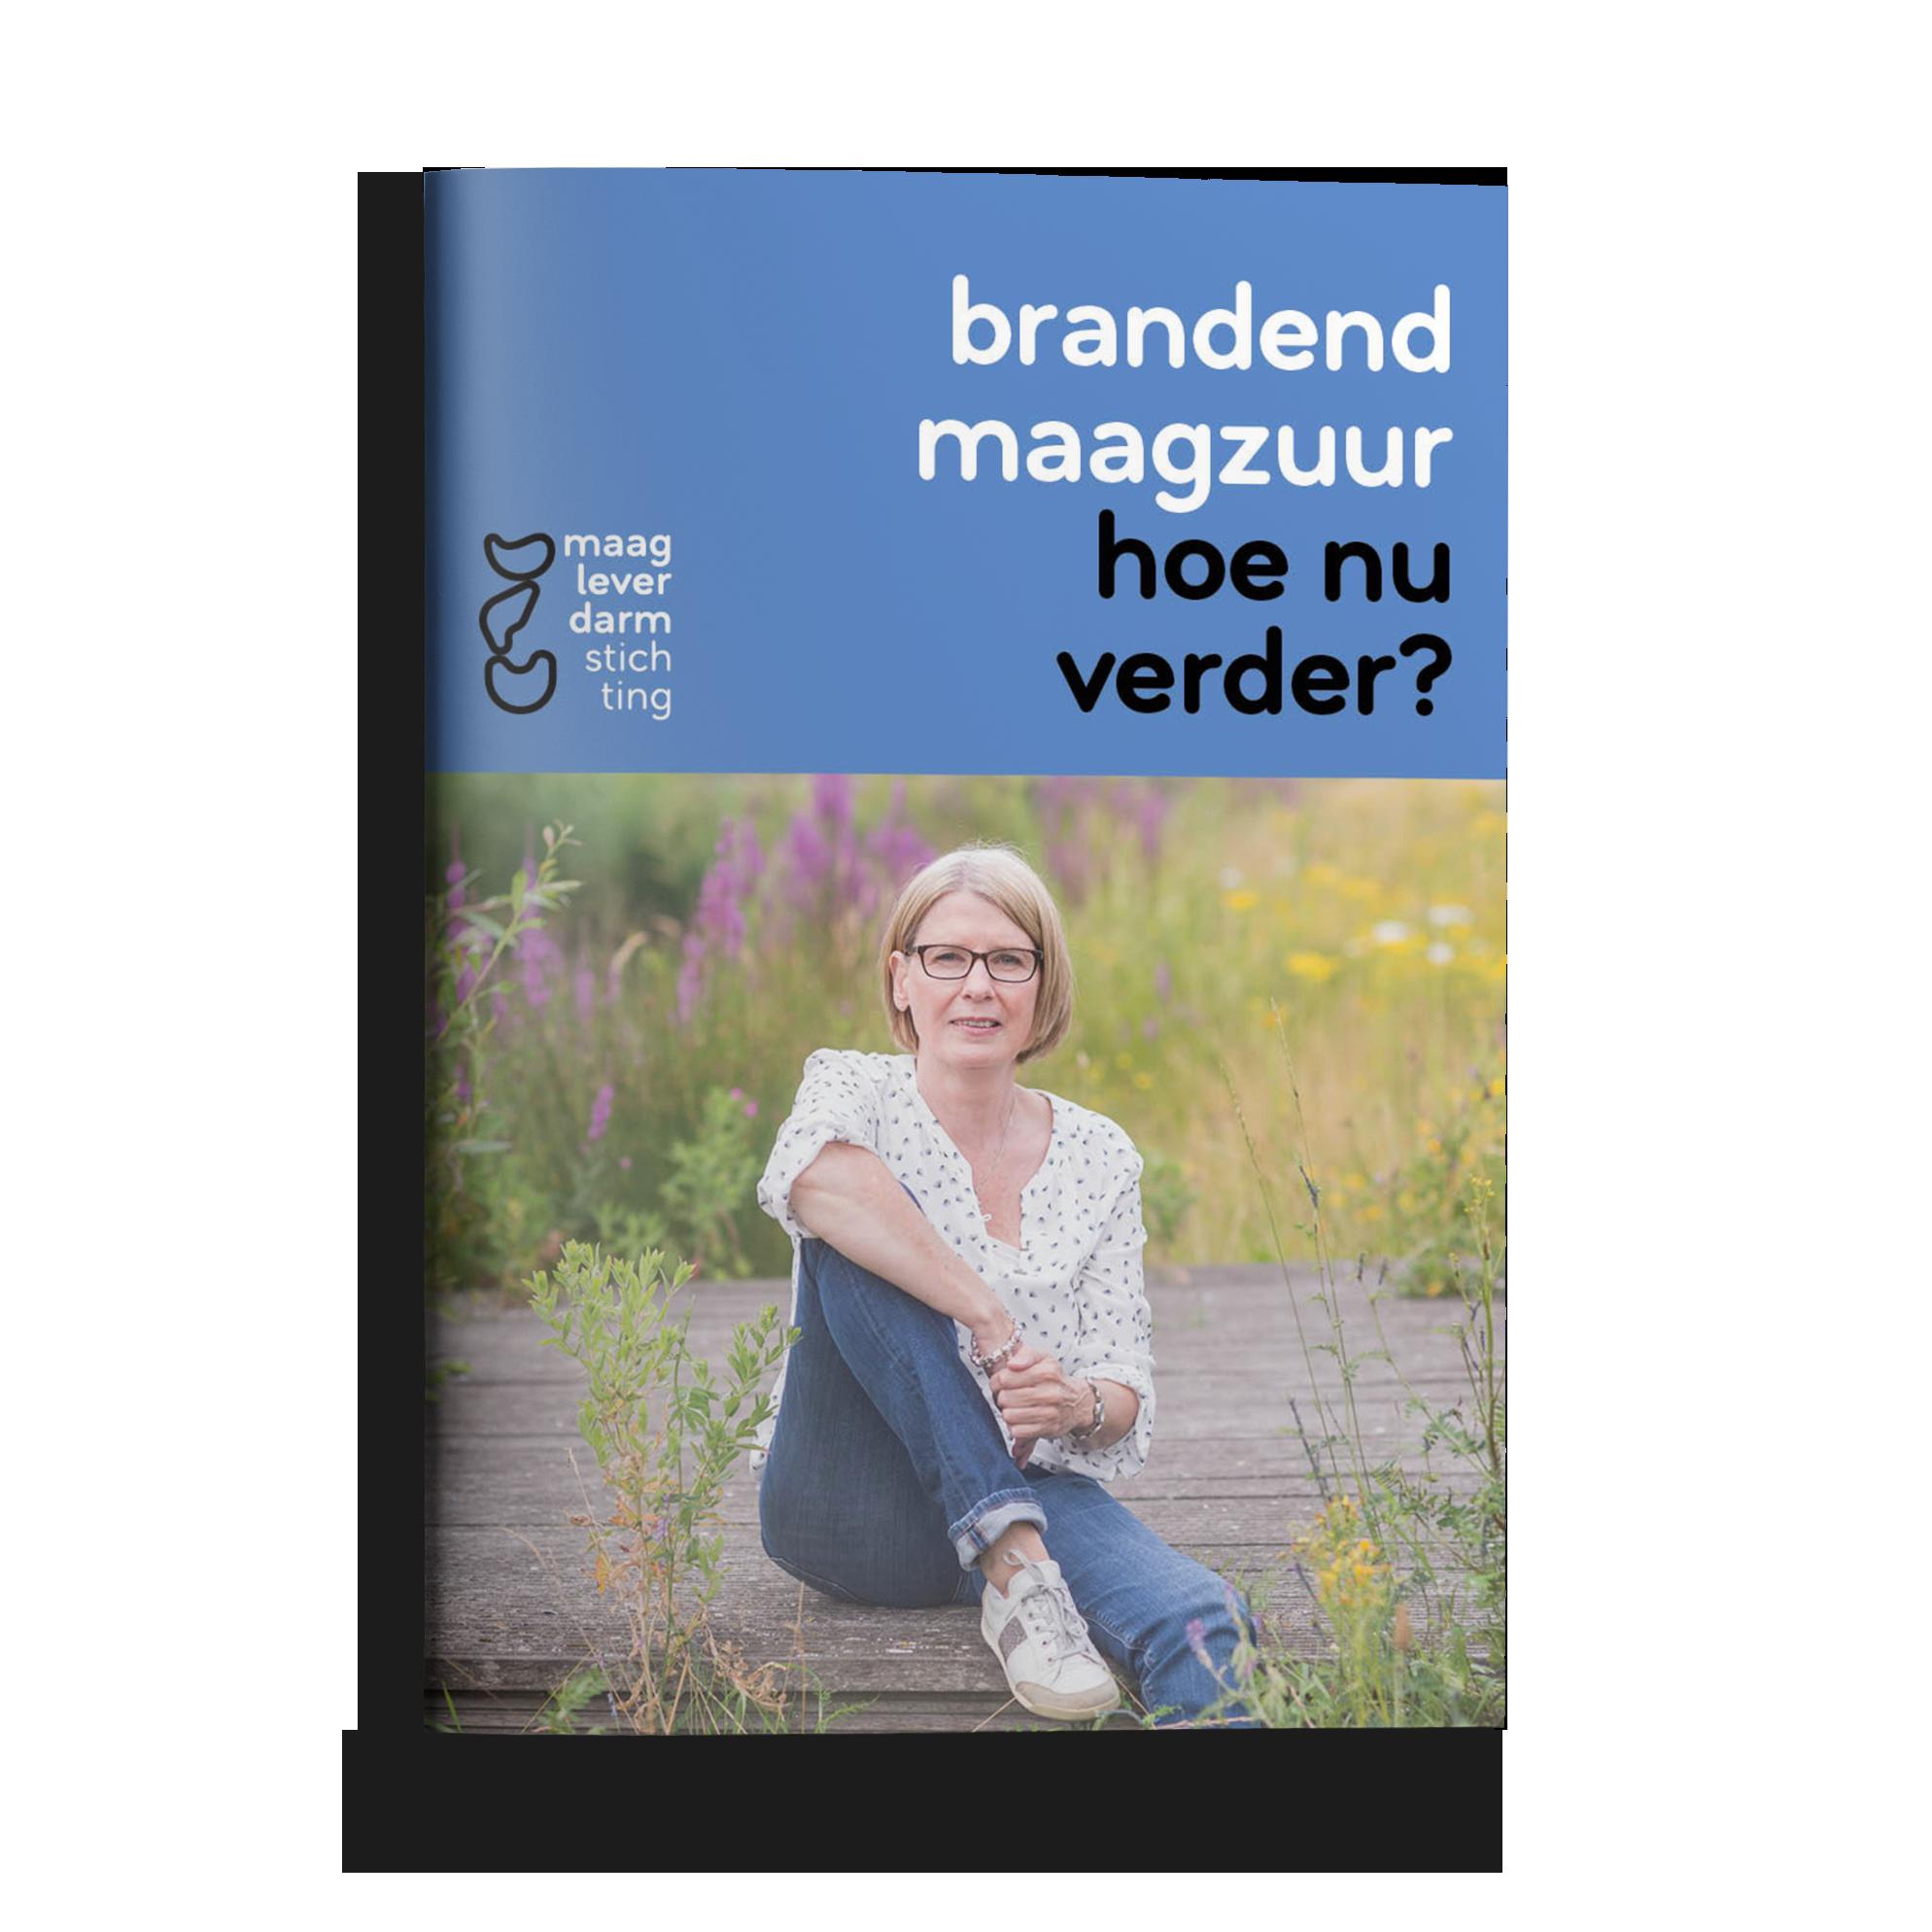 https://www.mlds.nl/content/uploads/brochure-brandend-maagzuur.png